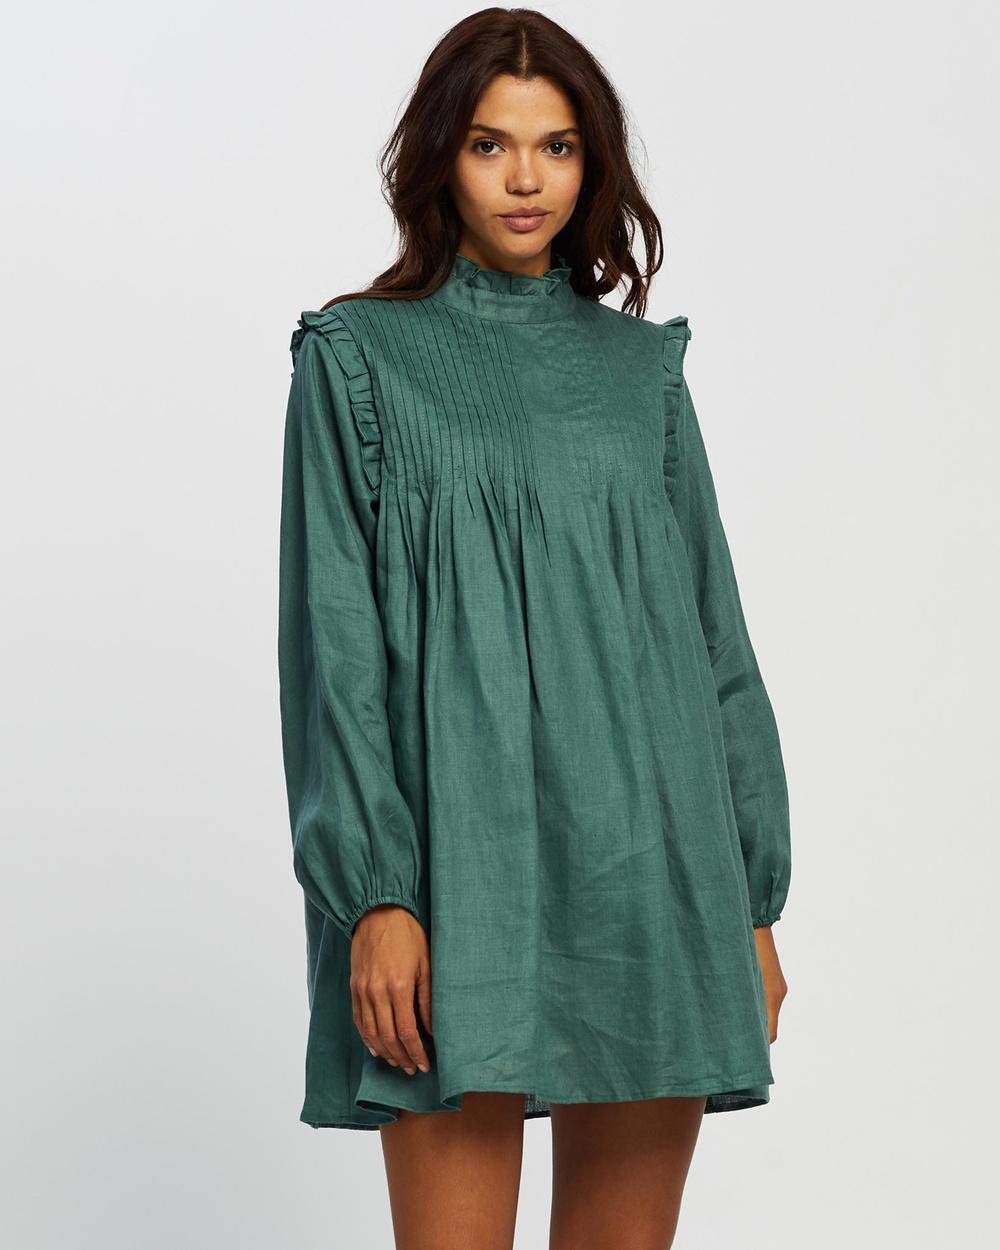 AERE Pleat Front Linen Smock Dress Dresses Botanical Green Australia